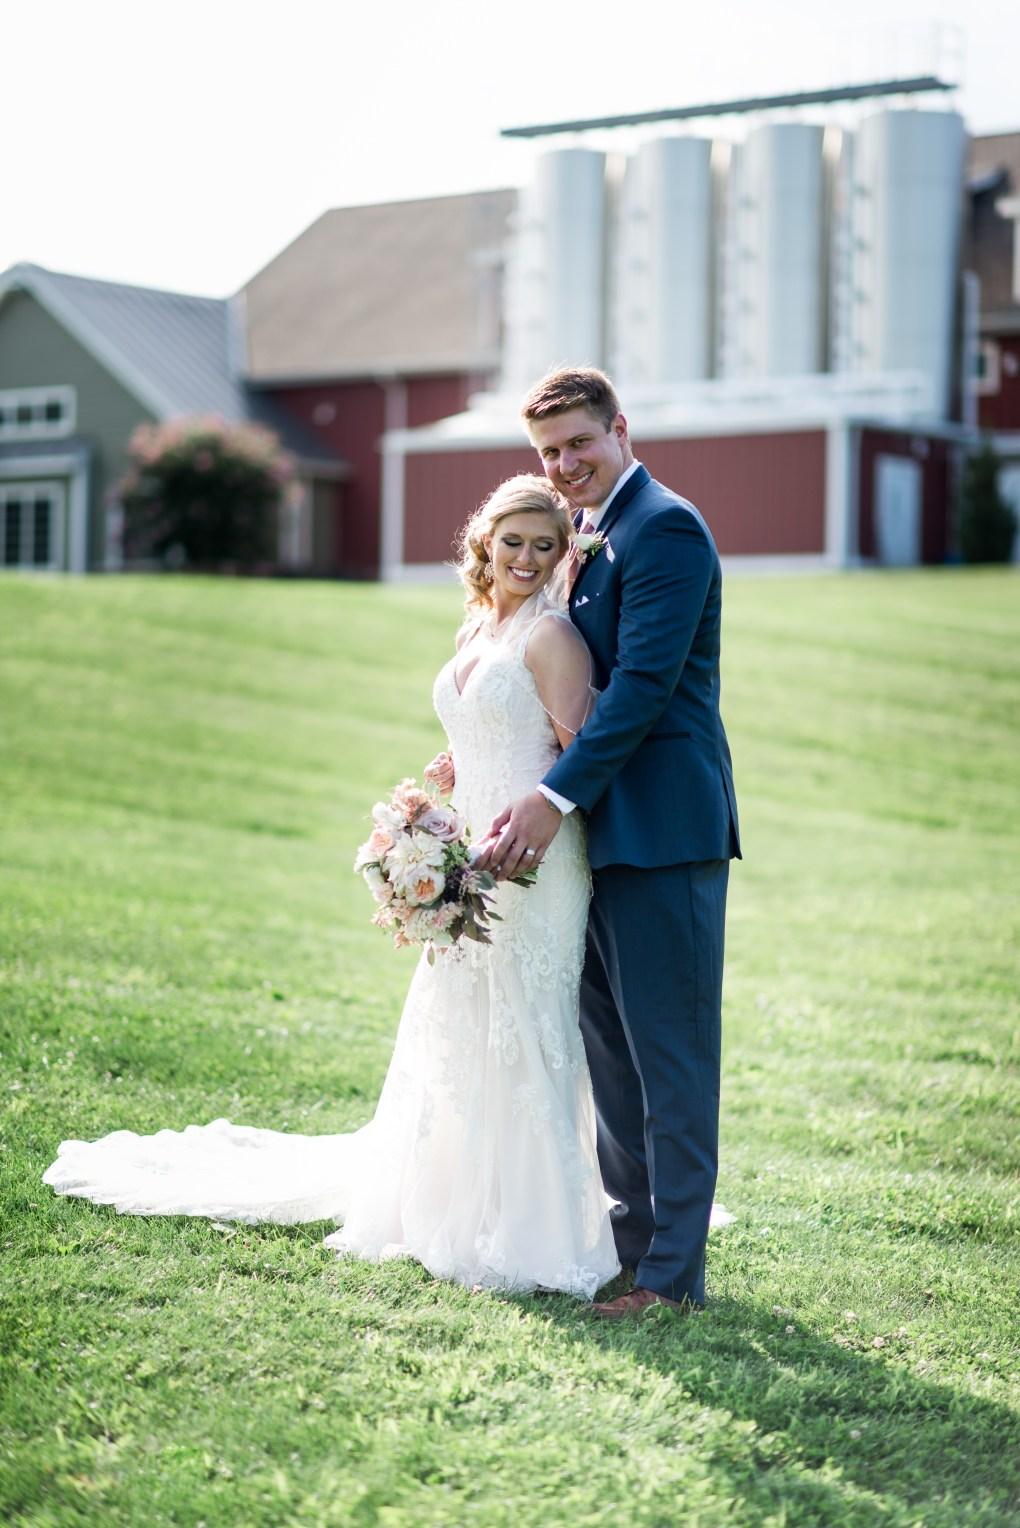 ANDREA & ERIC WEDDING-236